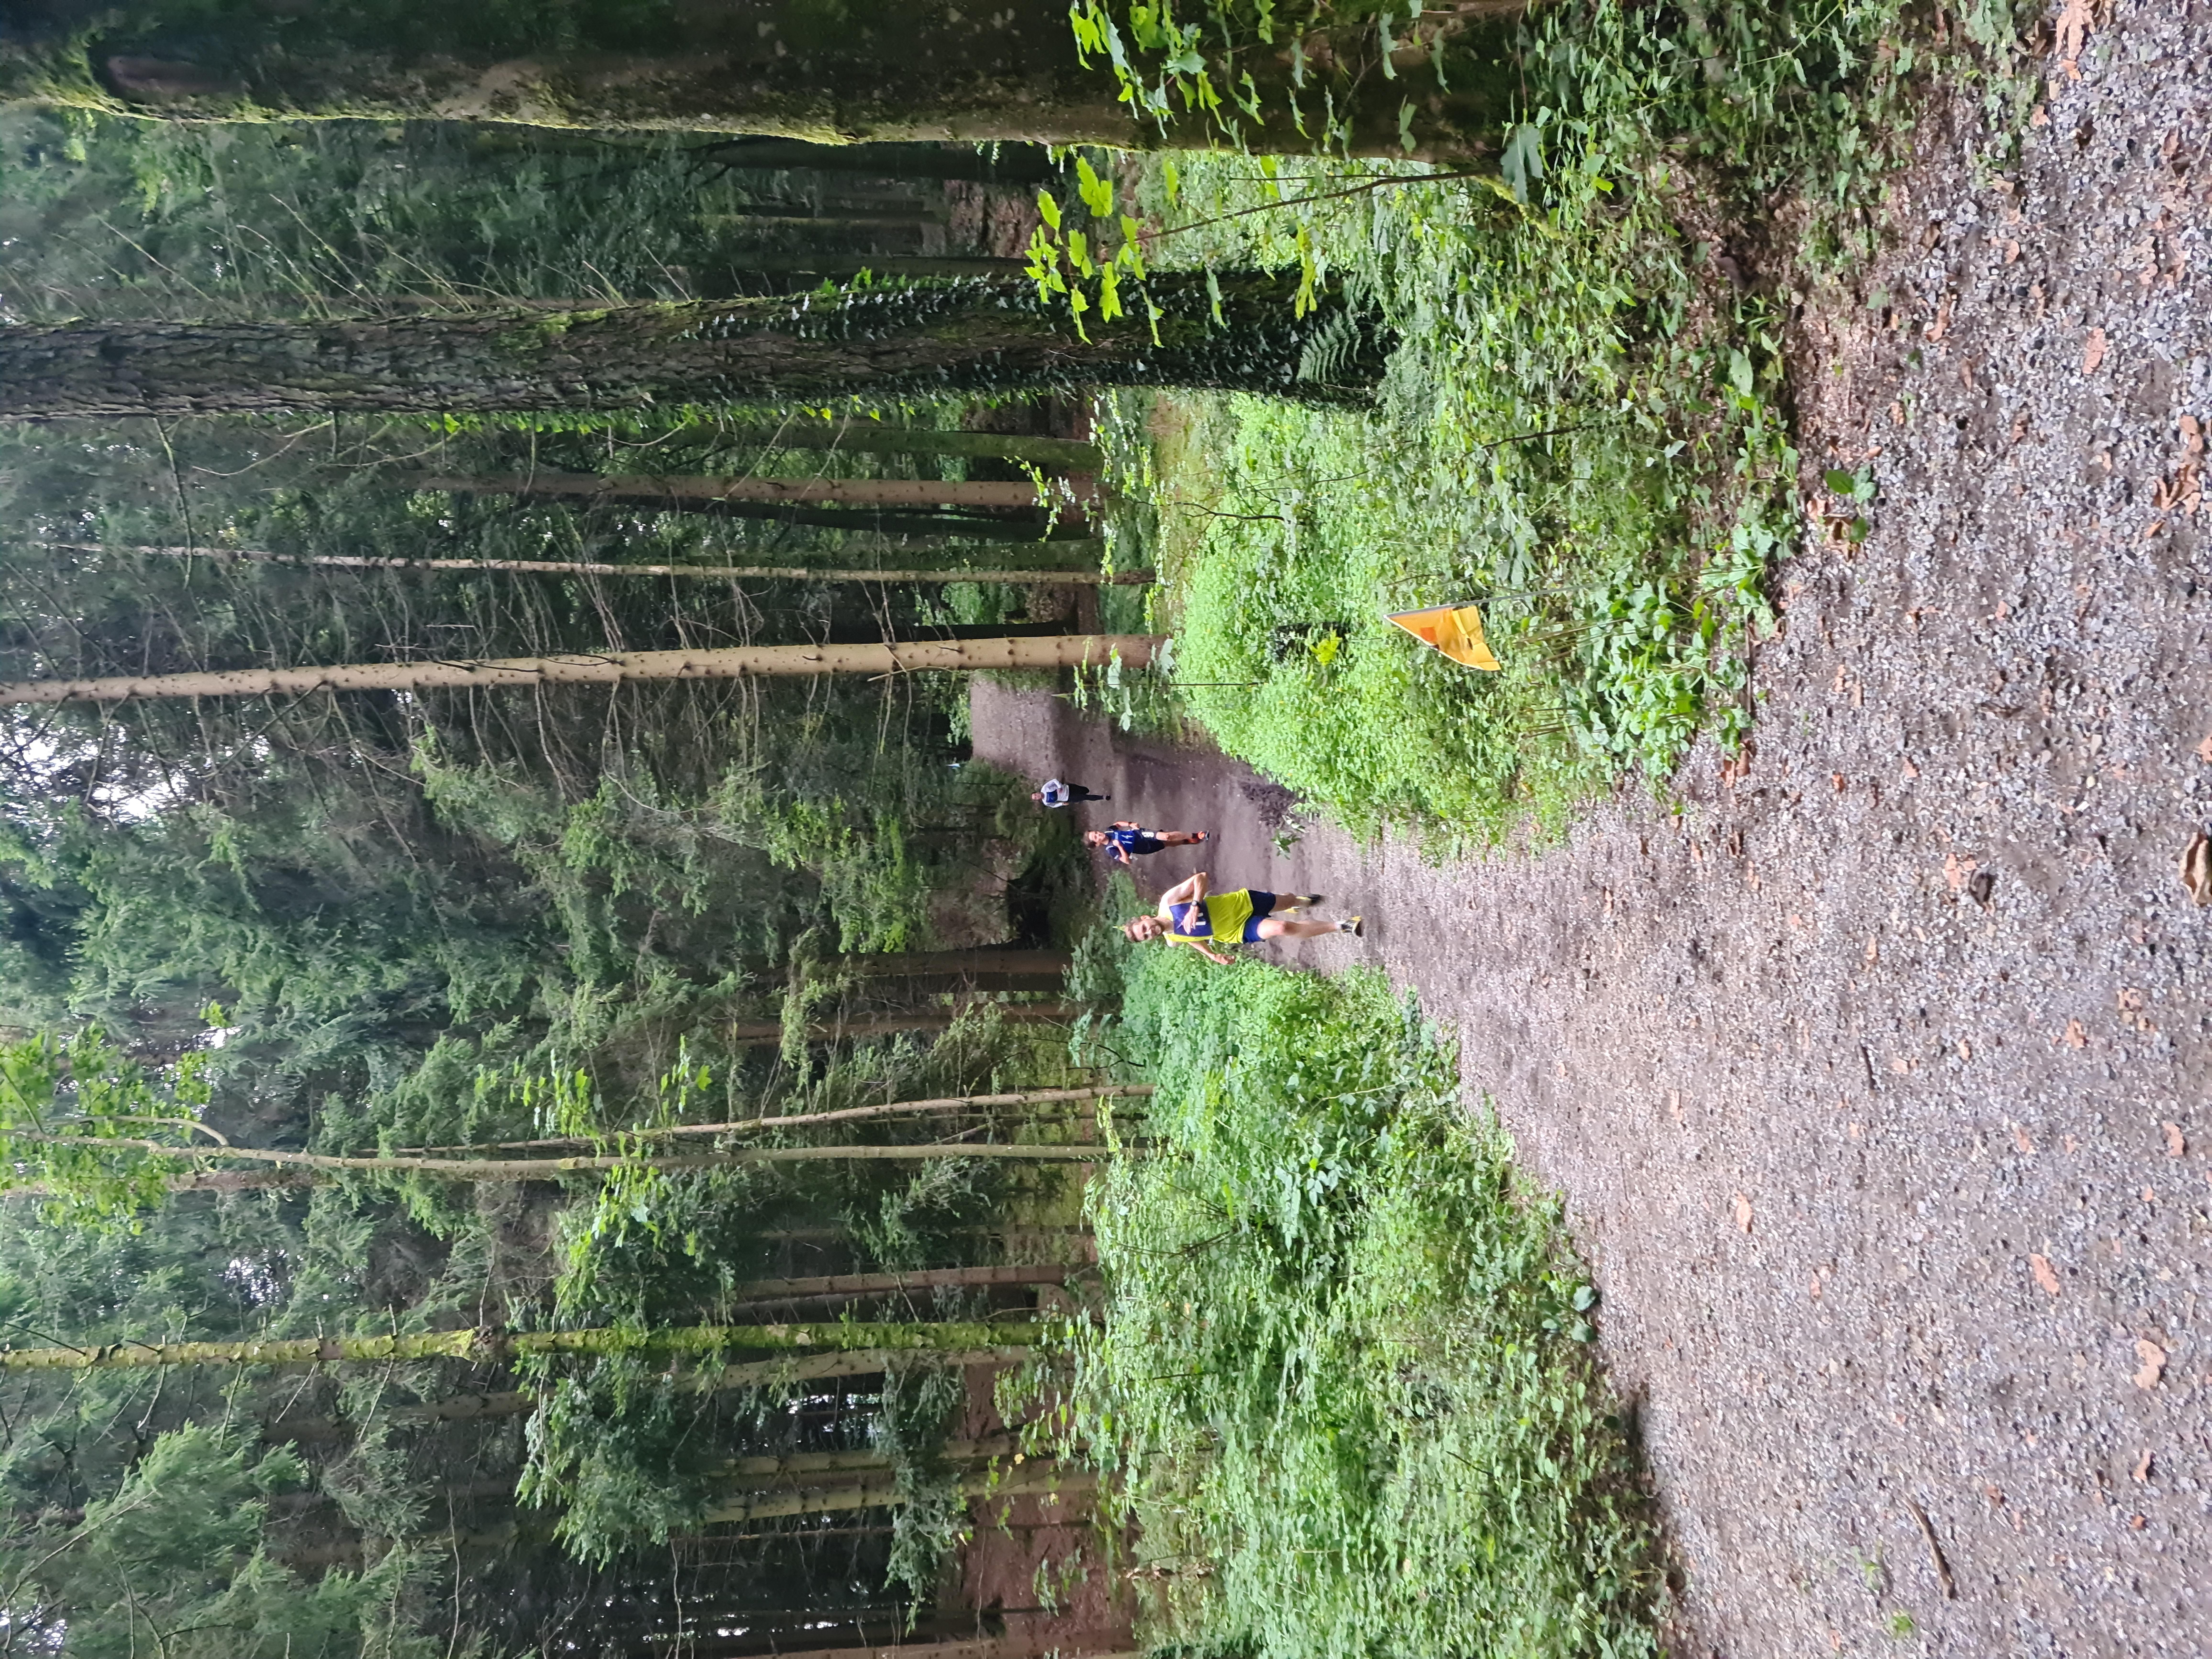 2021.08.25 Waldhauslauf